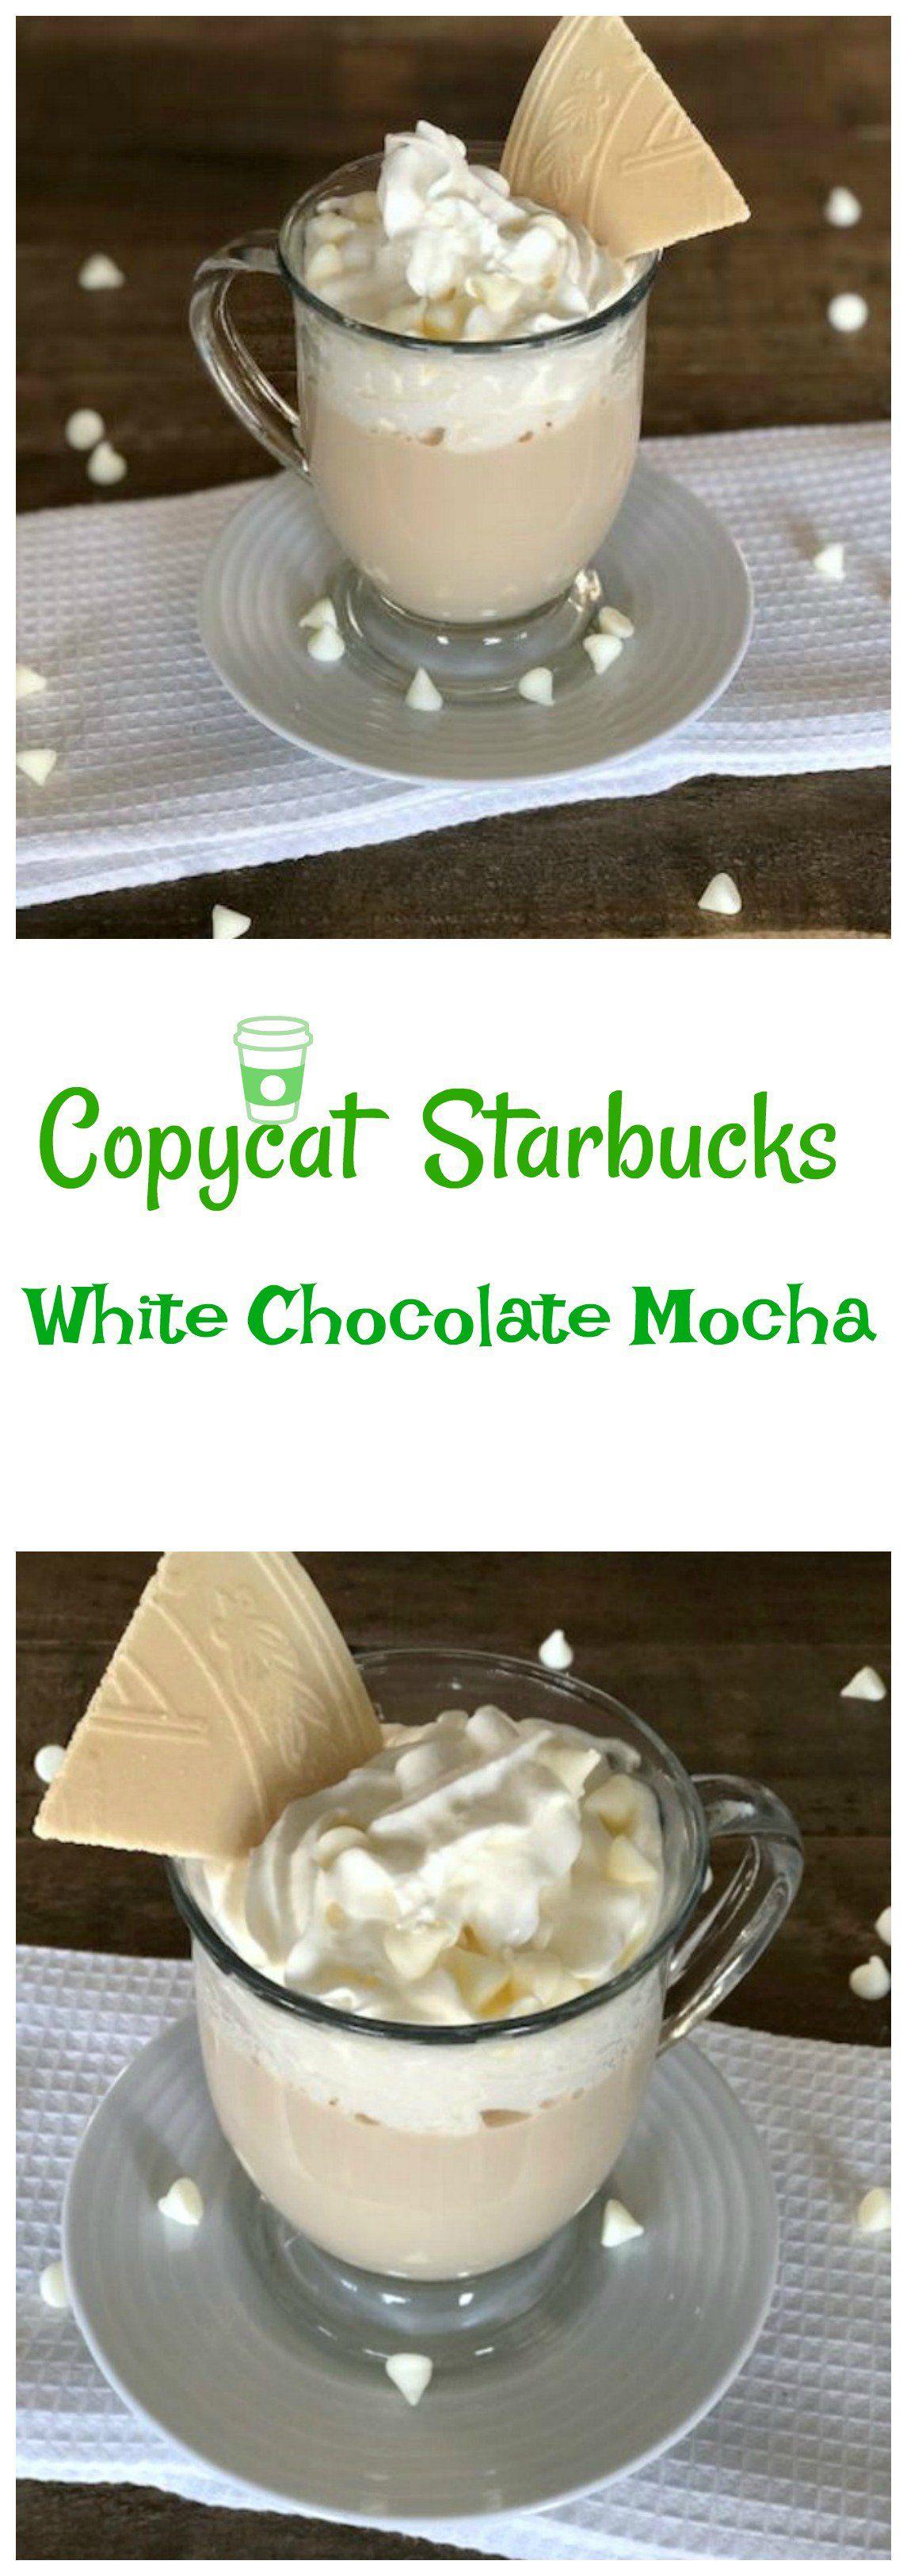 Copycat starbucks white chocolate mocha recipe